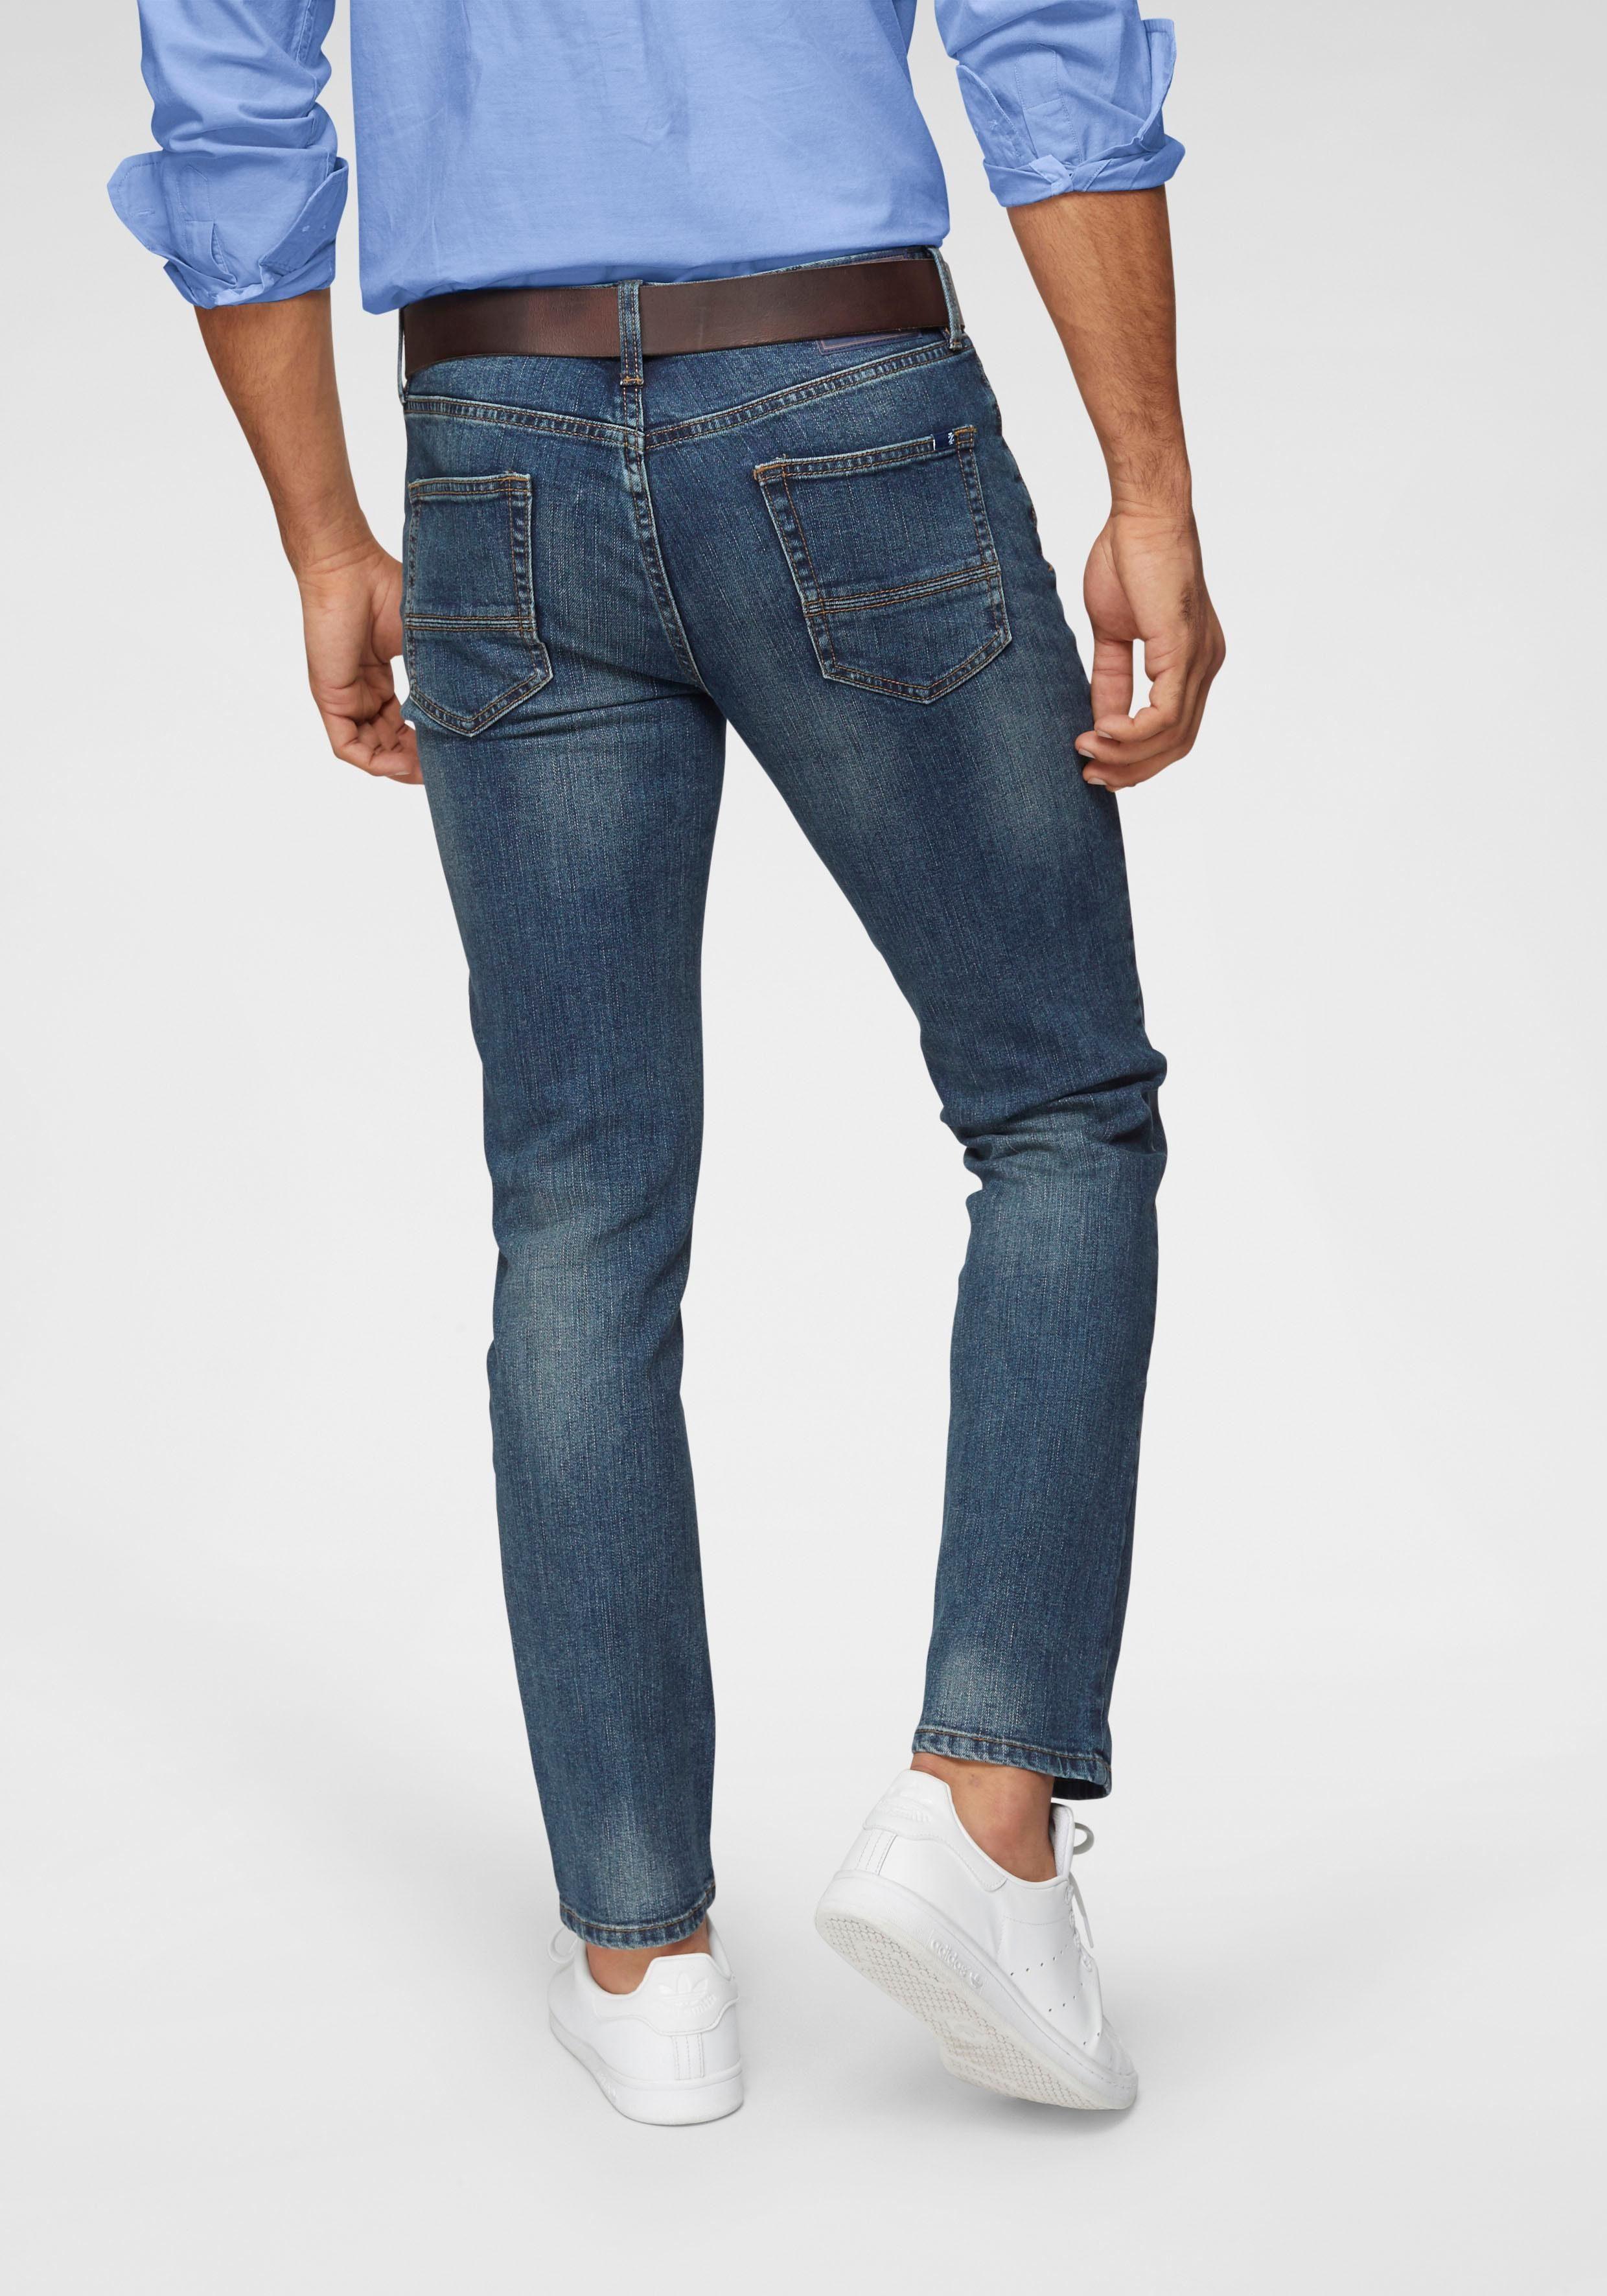 IZOD 5-Pocket-Jeans